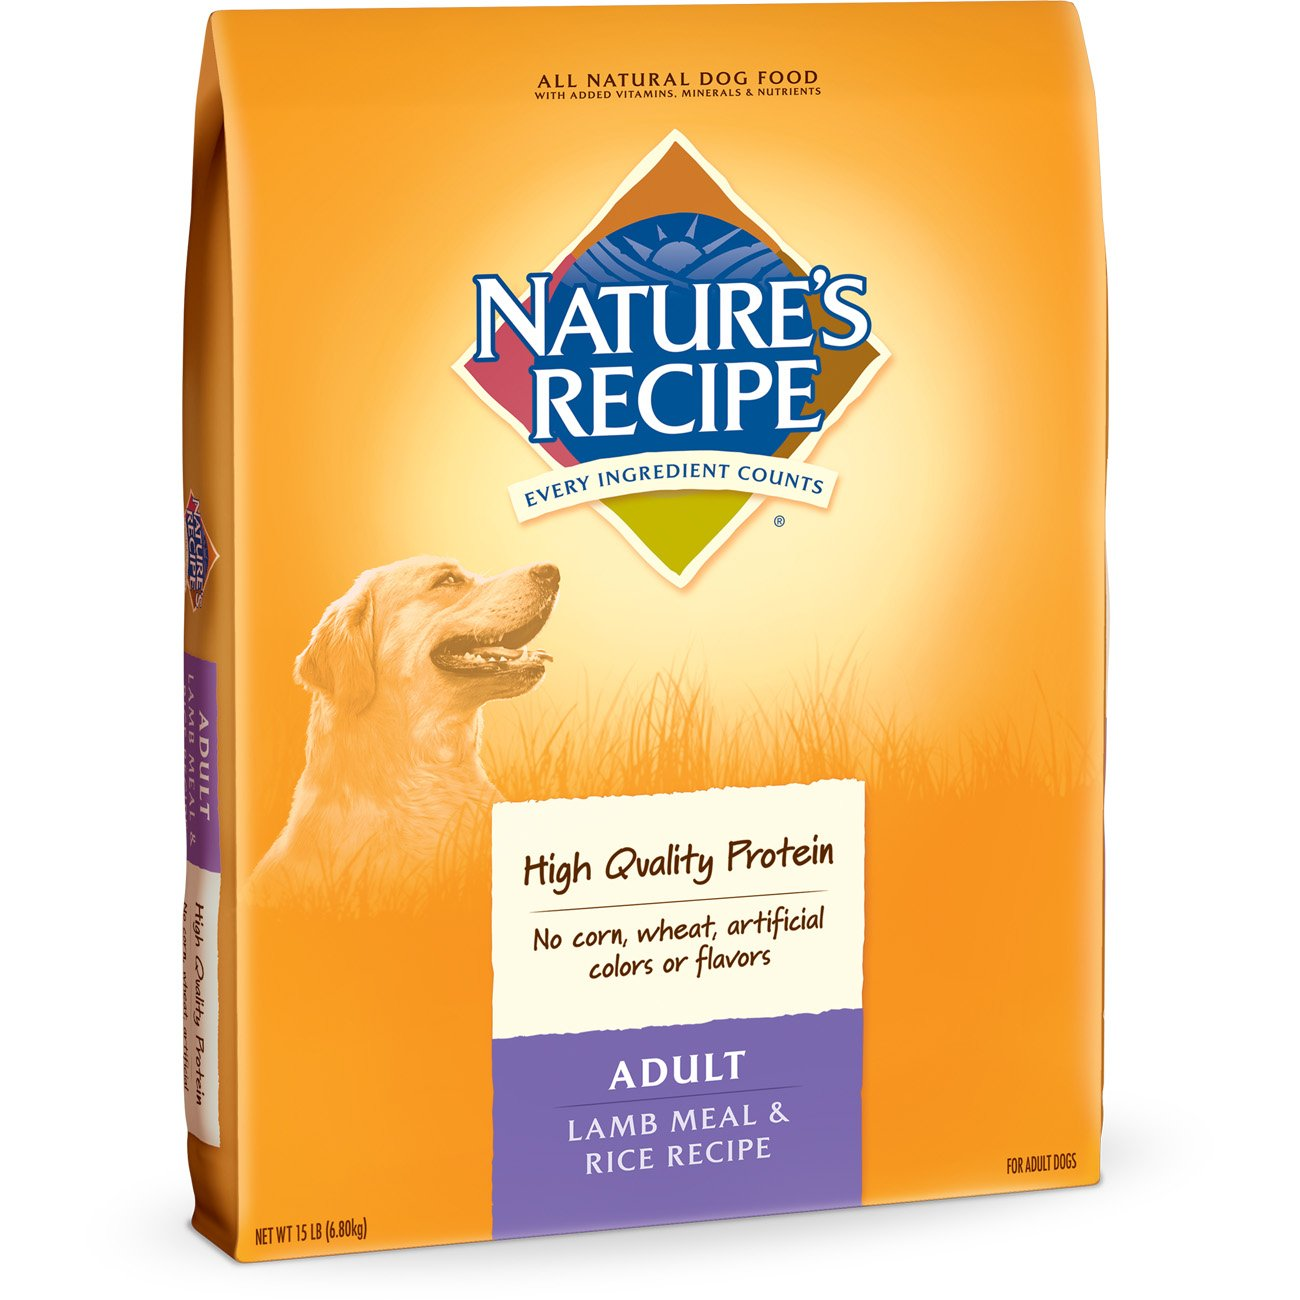 Amazon natures recipe adult dog food dry lamb meal rice amazon natures recipe adult dog food dry lamb meal rice recipe 15 pound pet supplies forumfinder Images